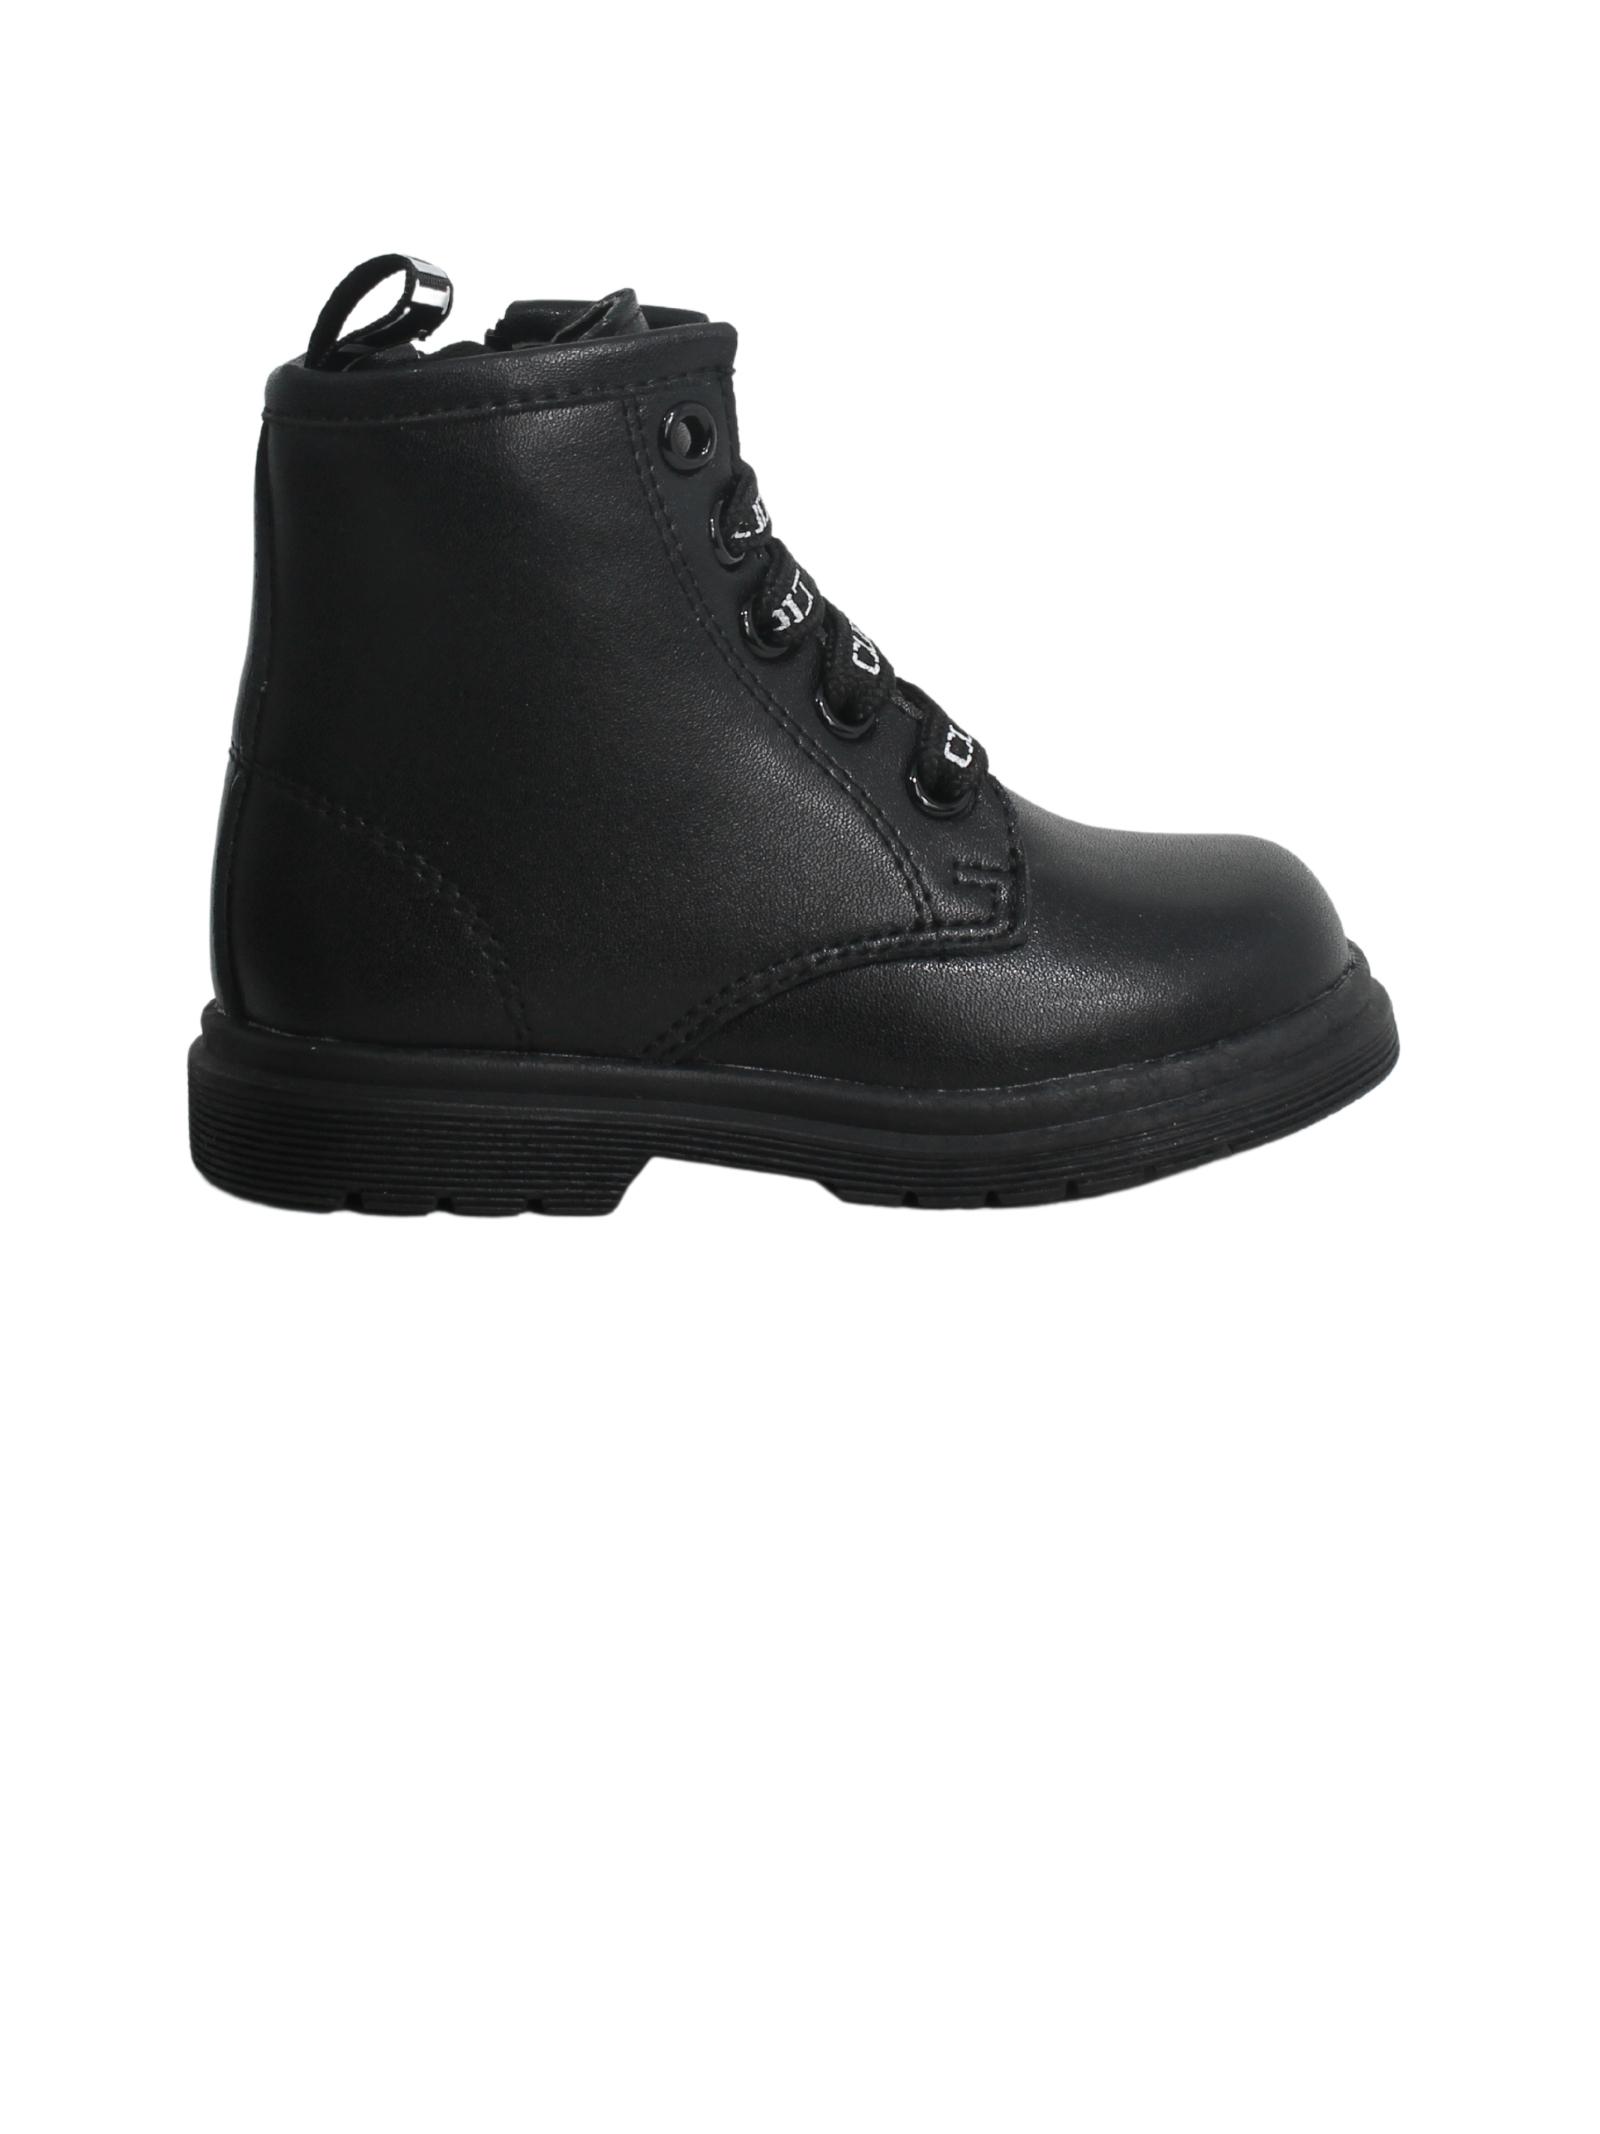 Boys / girls imitation leather combat boots CULT | Amphibians | START1BLACK